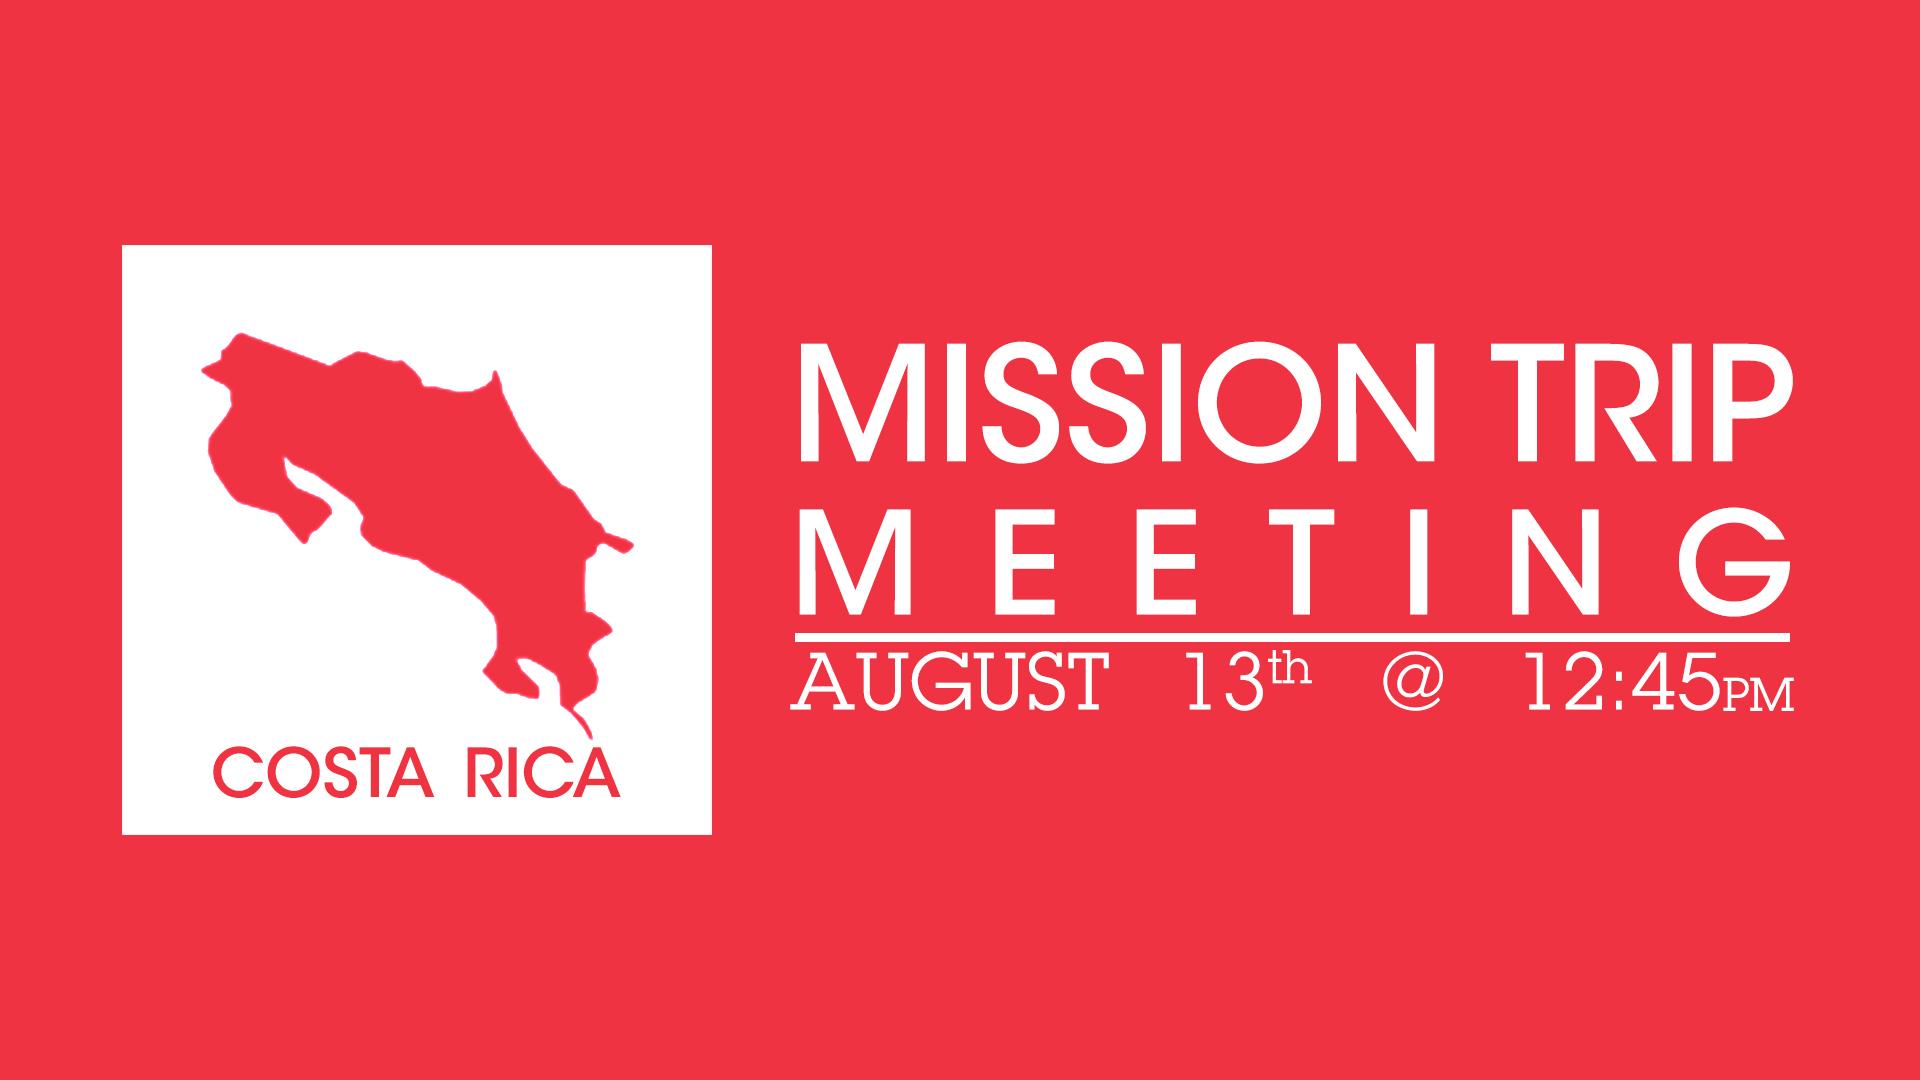 Costa Rica Mission Trip Meeting